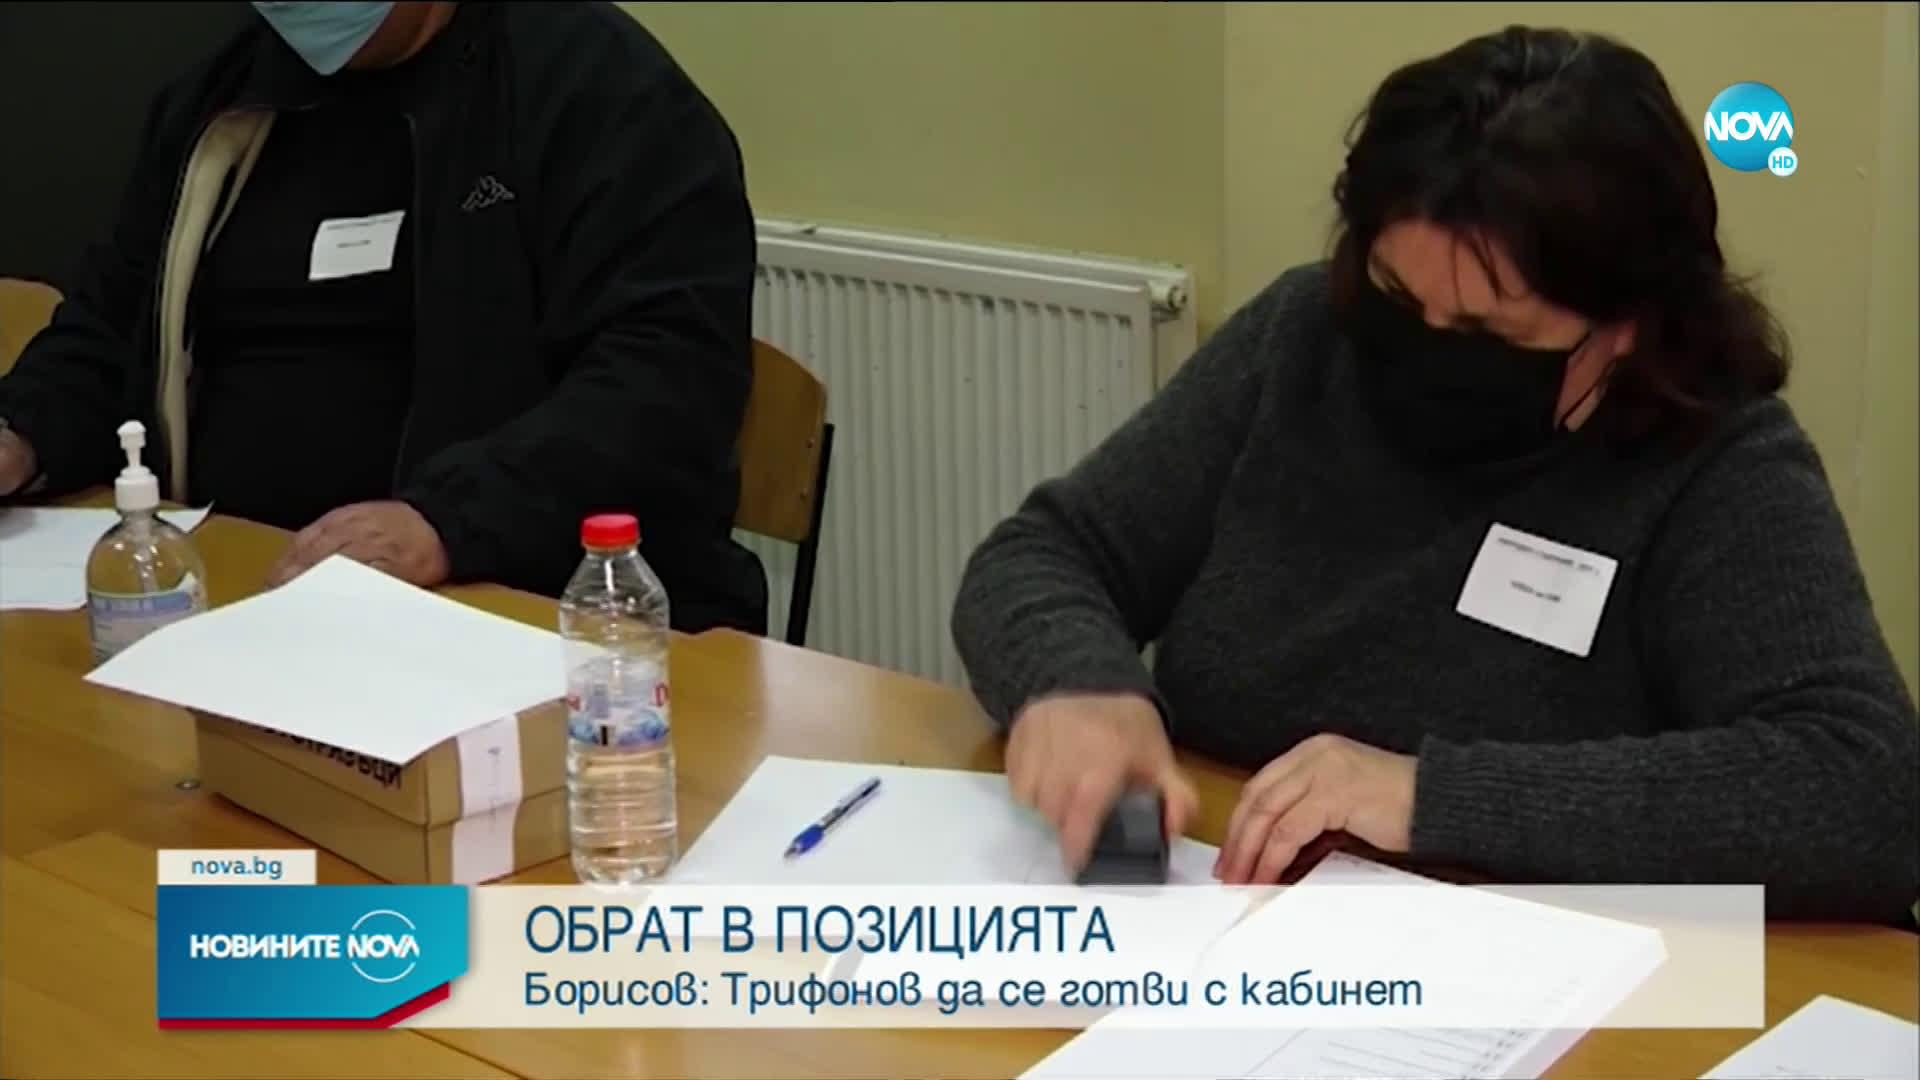 Борисов: Трифонов да се готви с кабинет